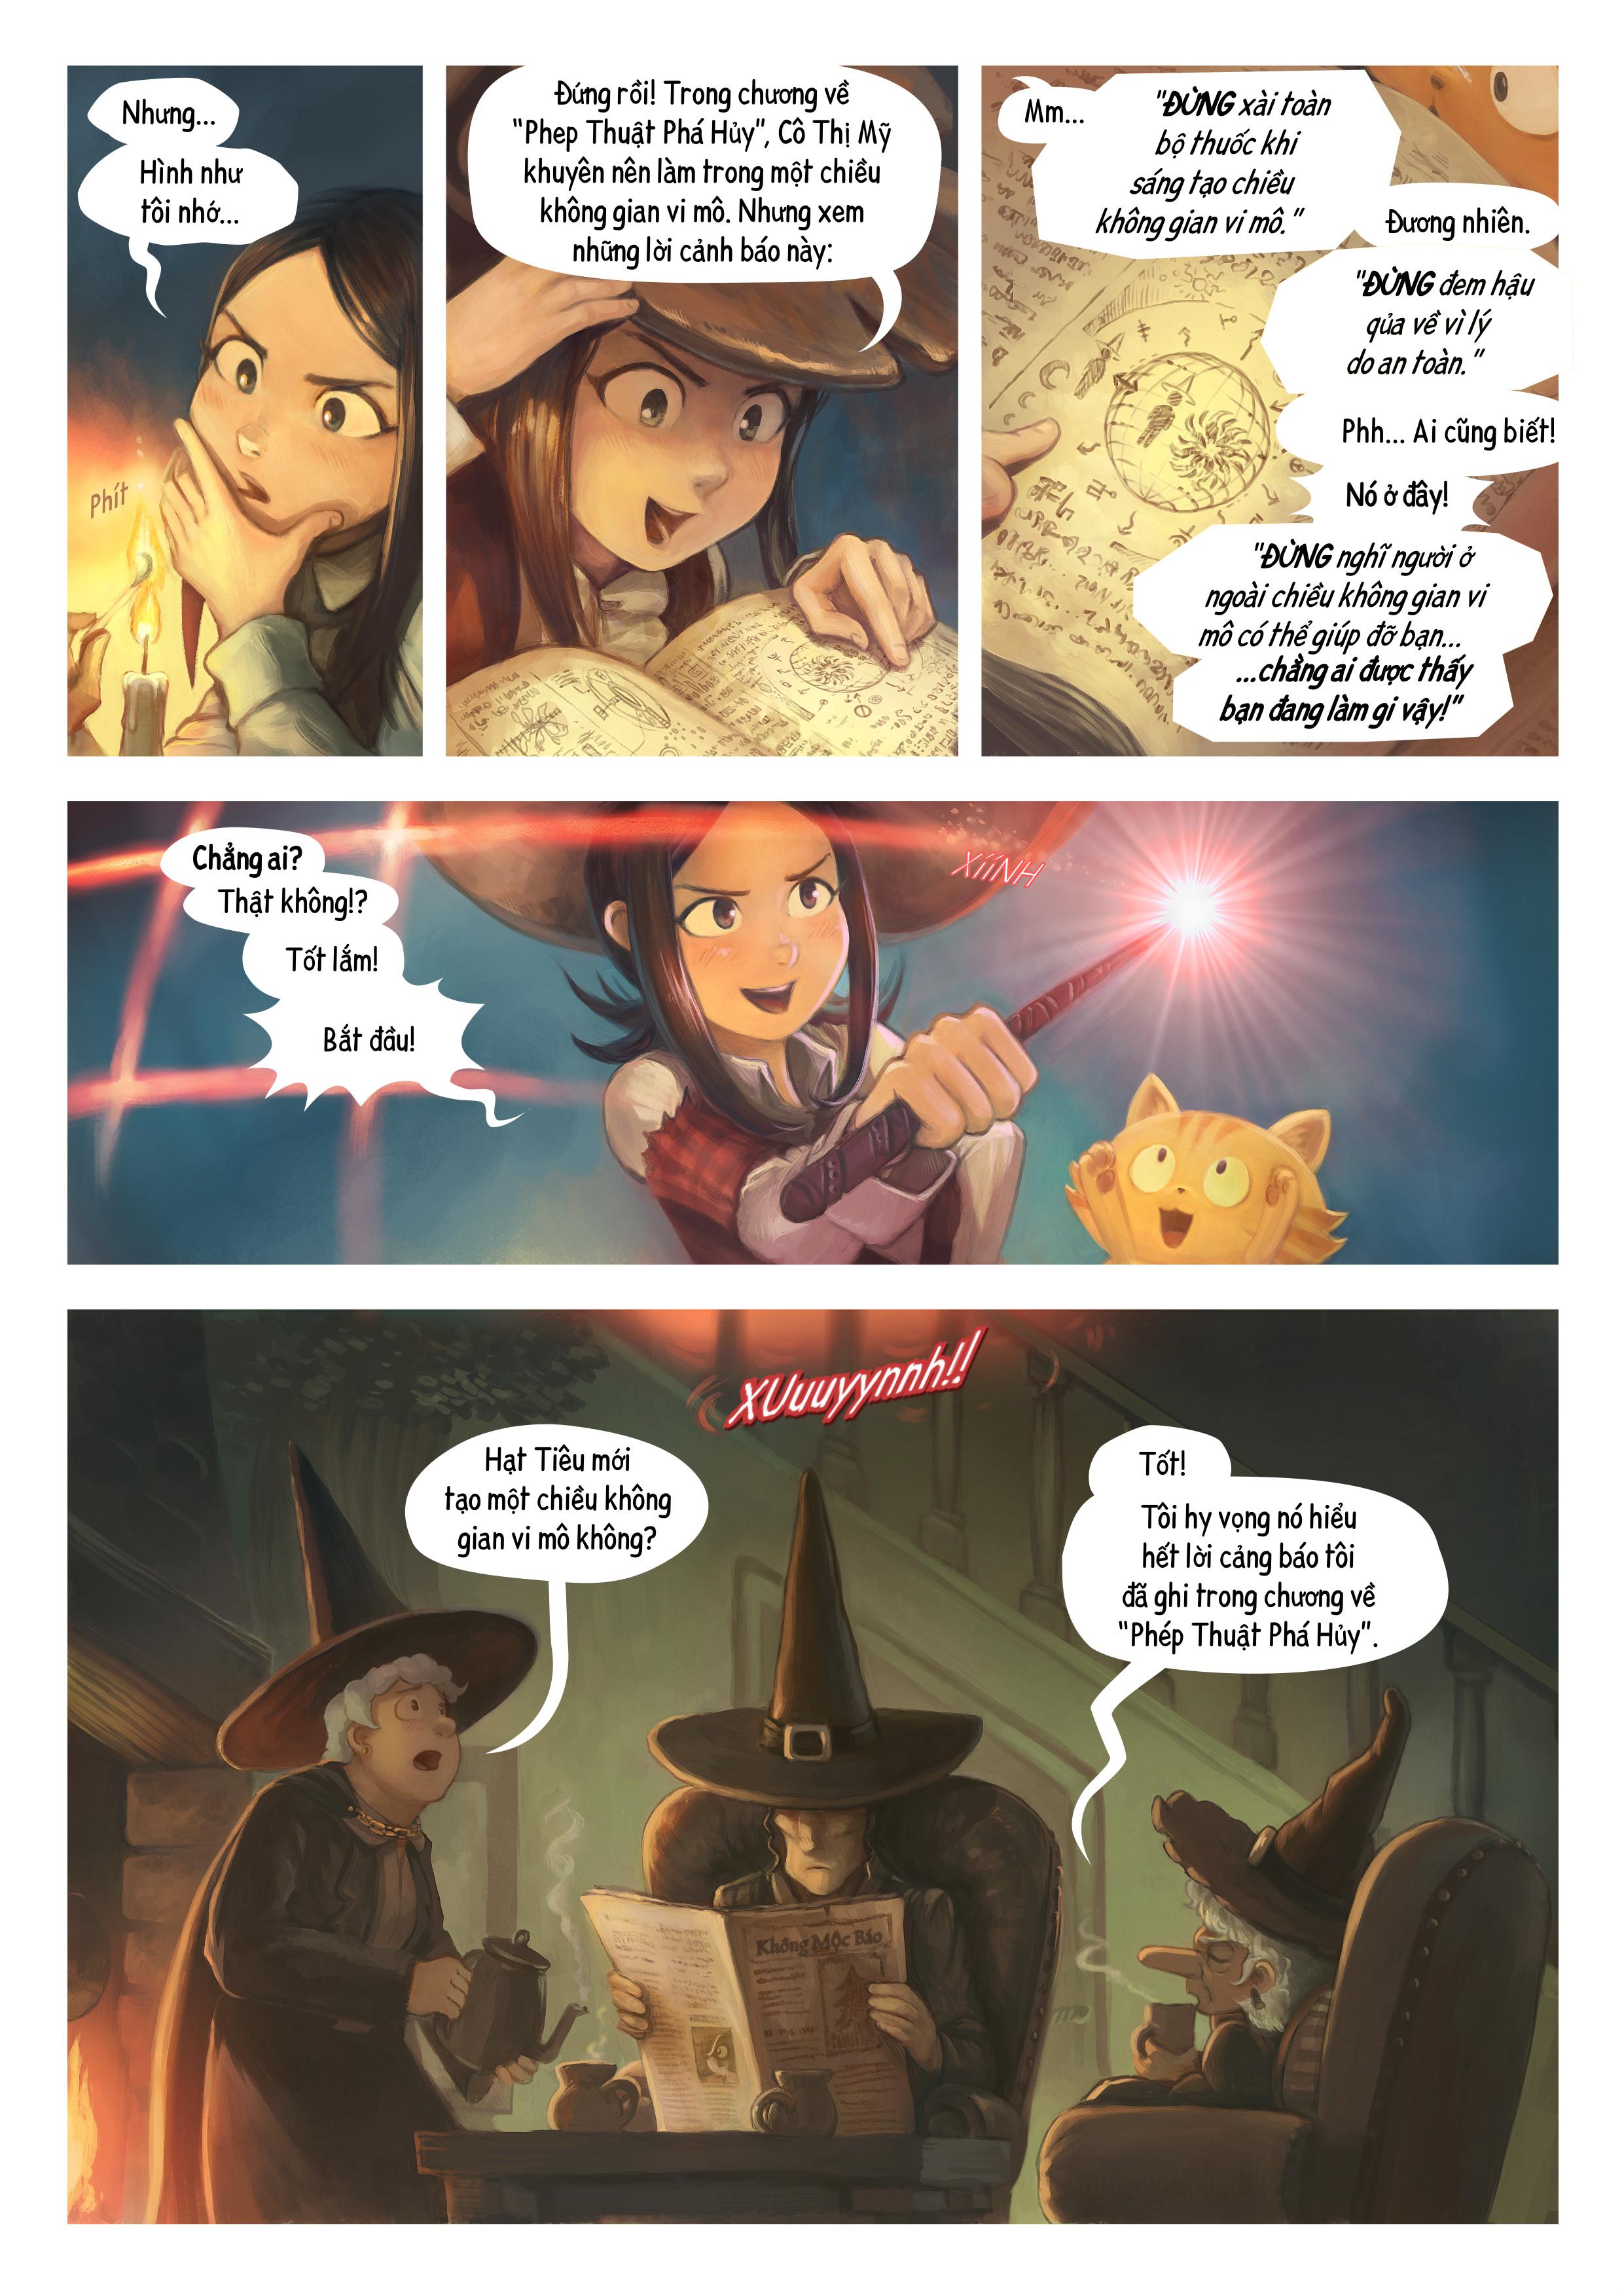 A webcomic page of Pepper&Carrot, Tập 24 [vi], trang 3